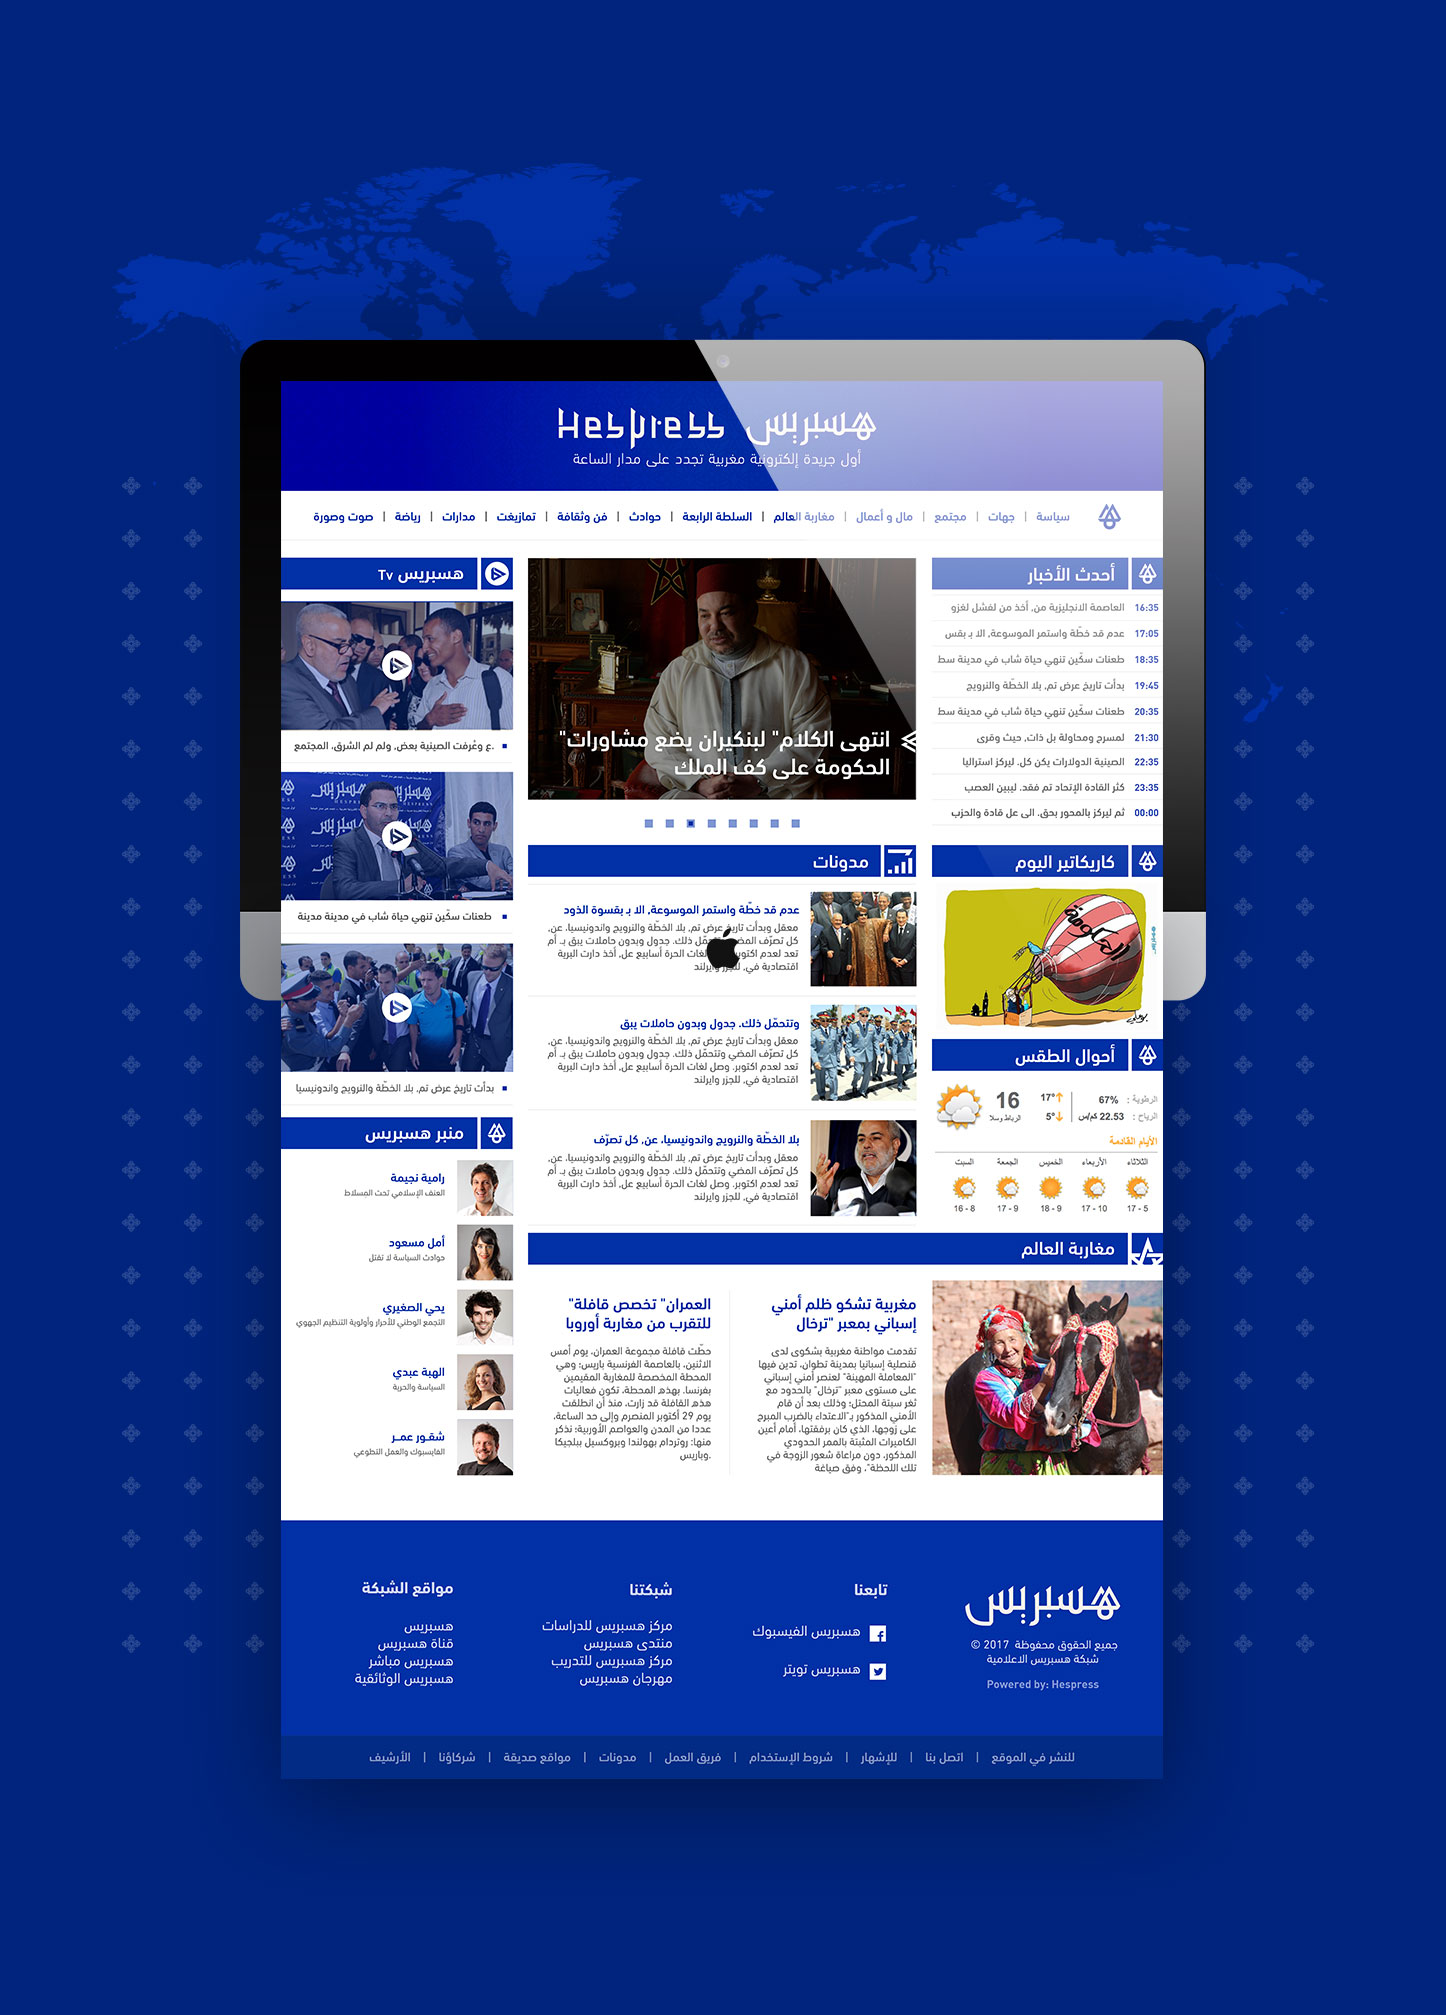 branding-hespress-logo-corporate-design-mouhtadi-design_09